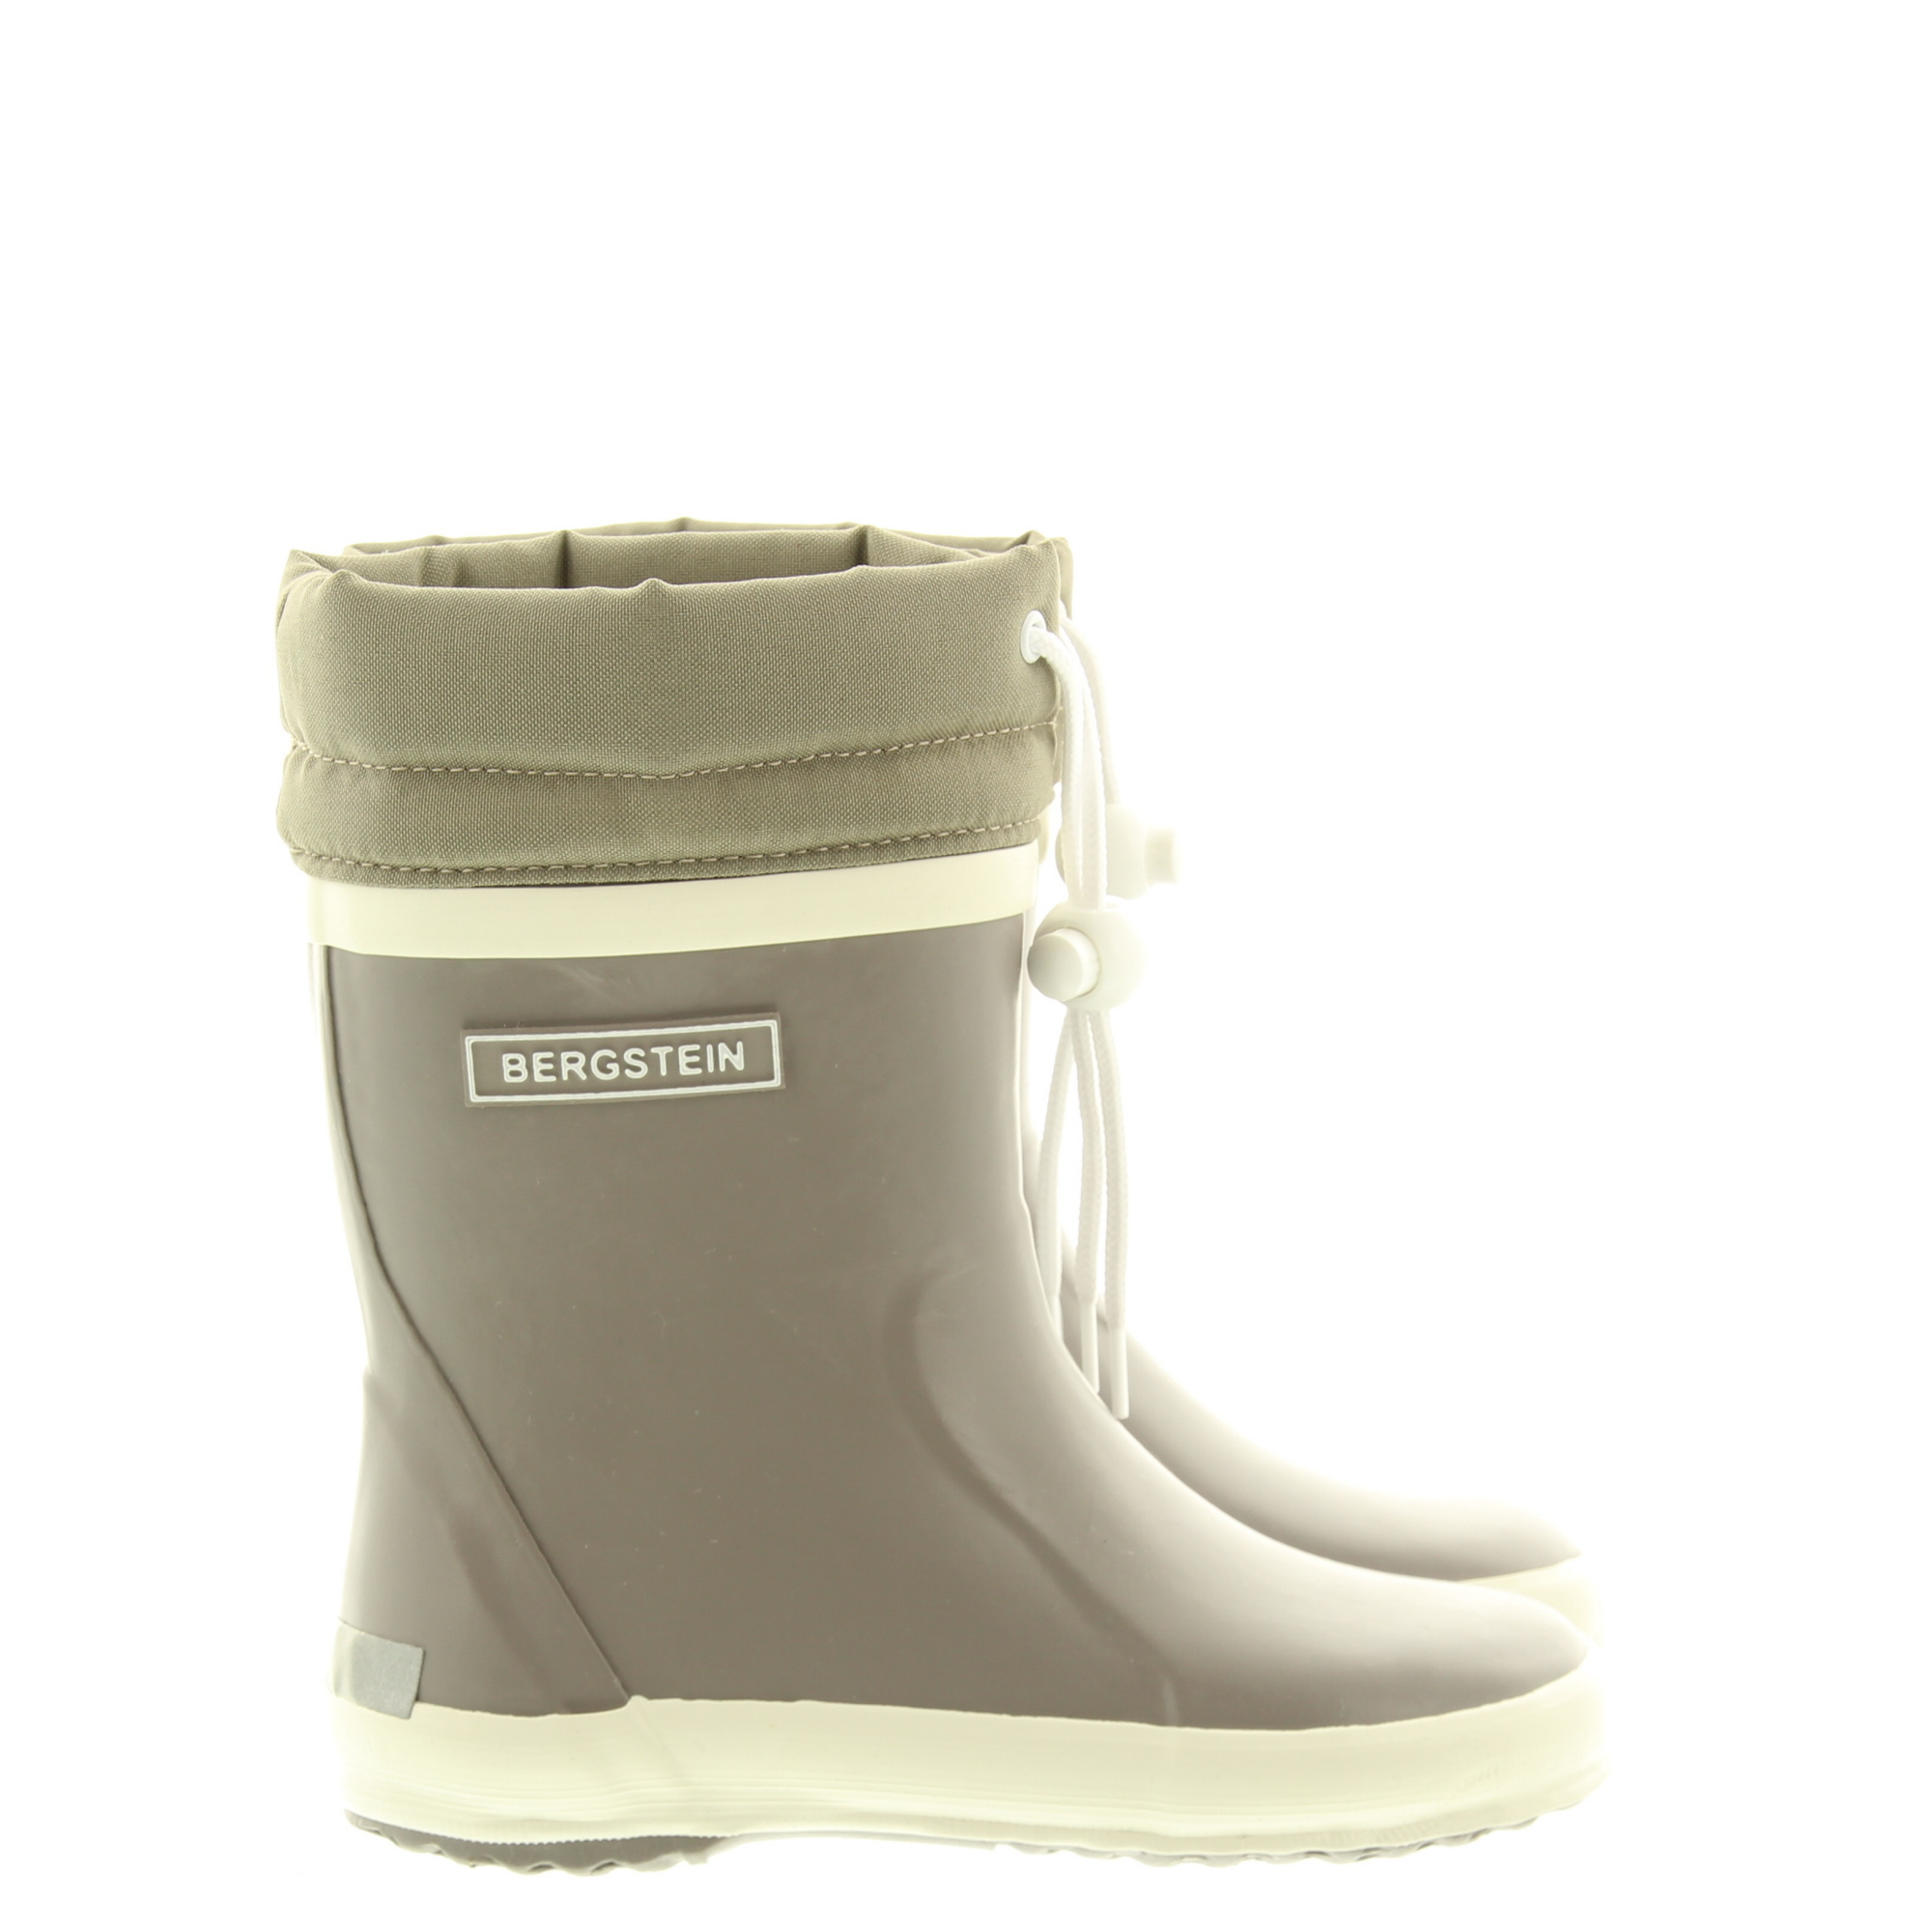 Bergstein Rainboot winter Taupe